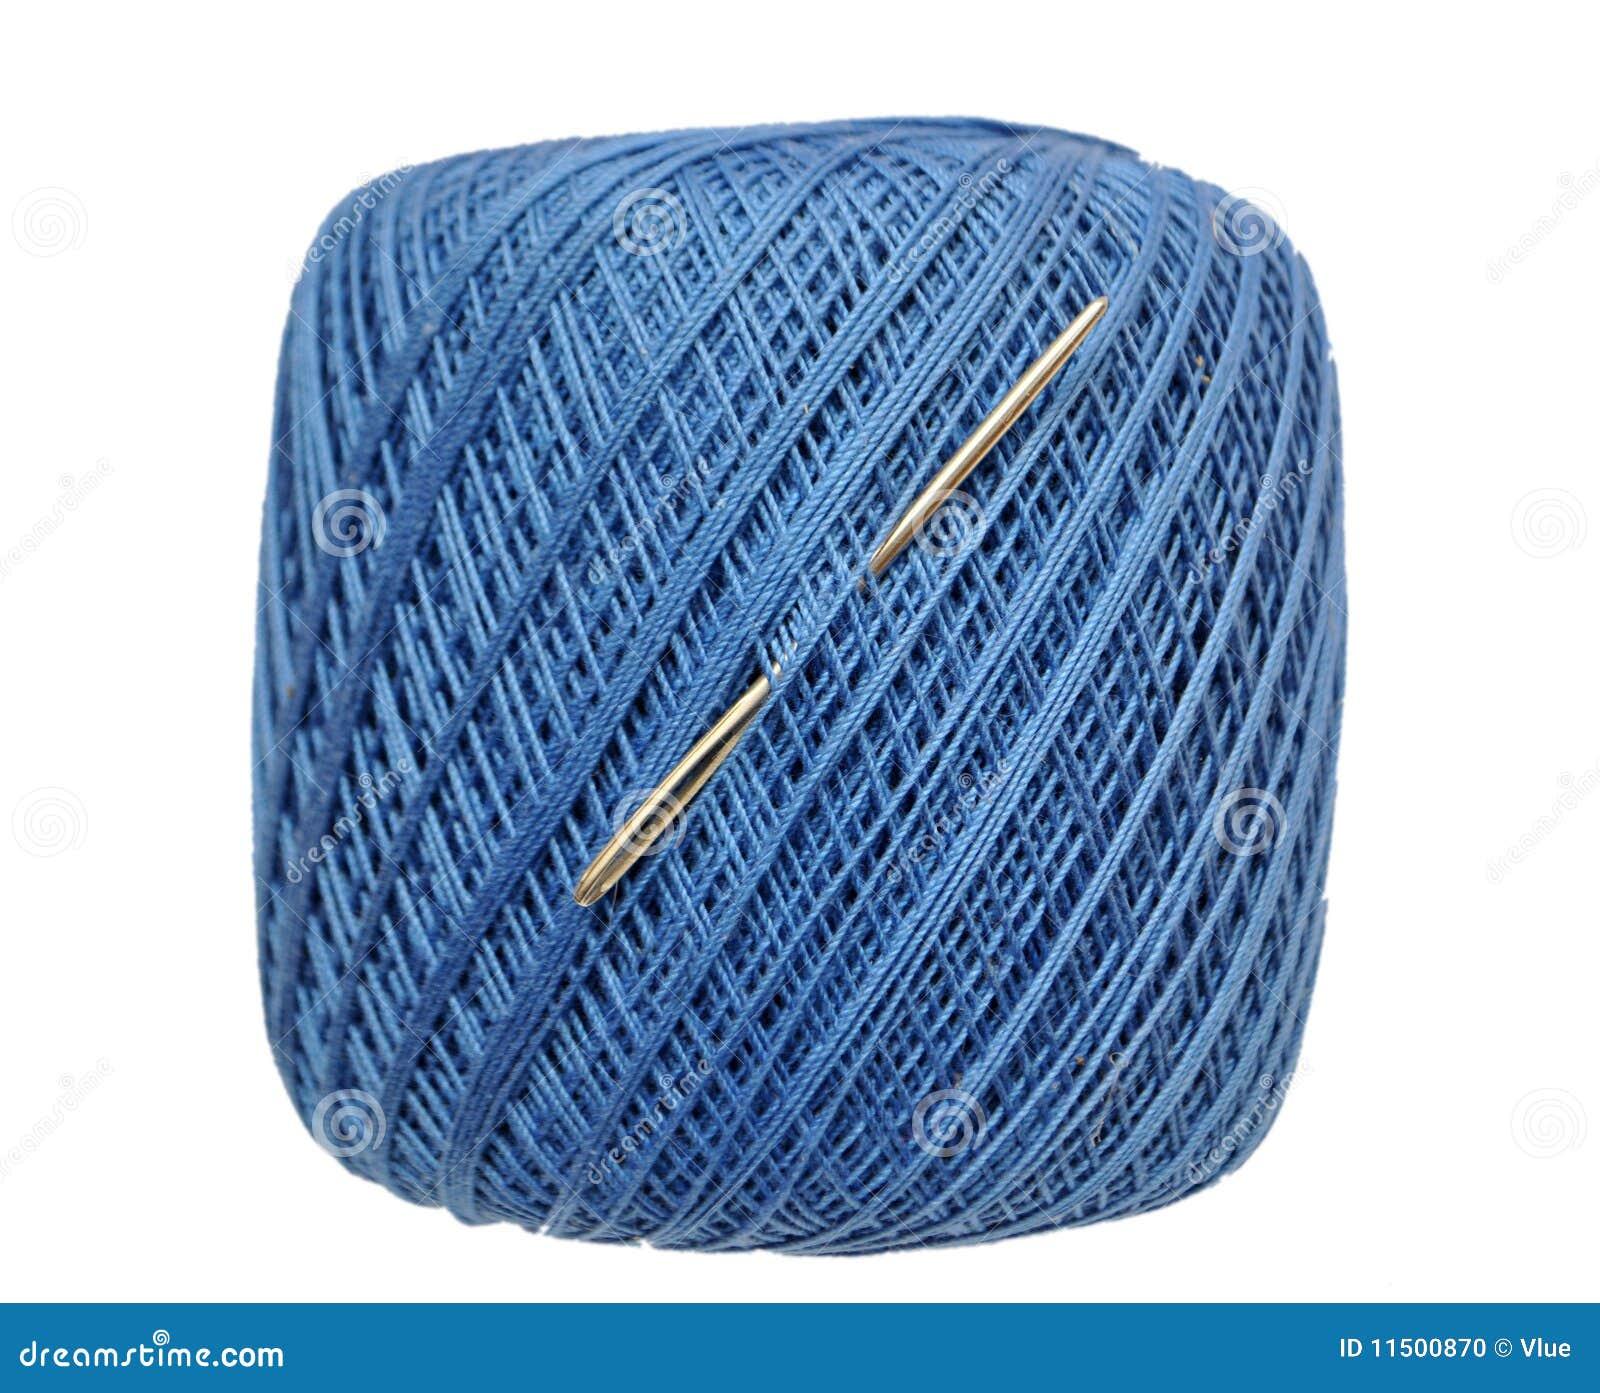 blue yarn spool stock photo image of loop bundle cotton 11500870